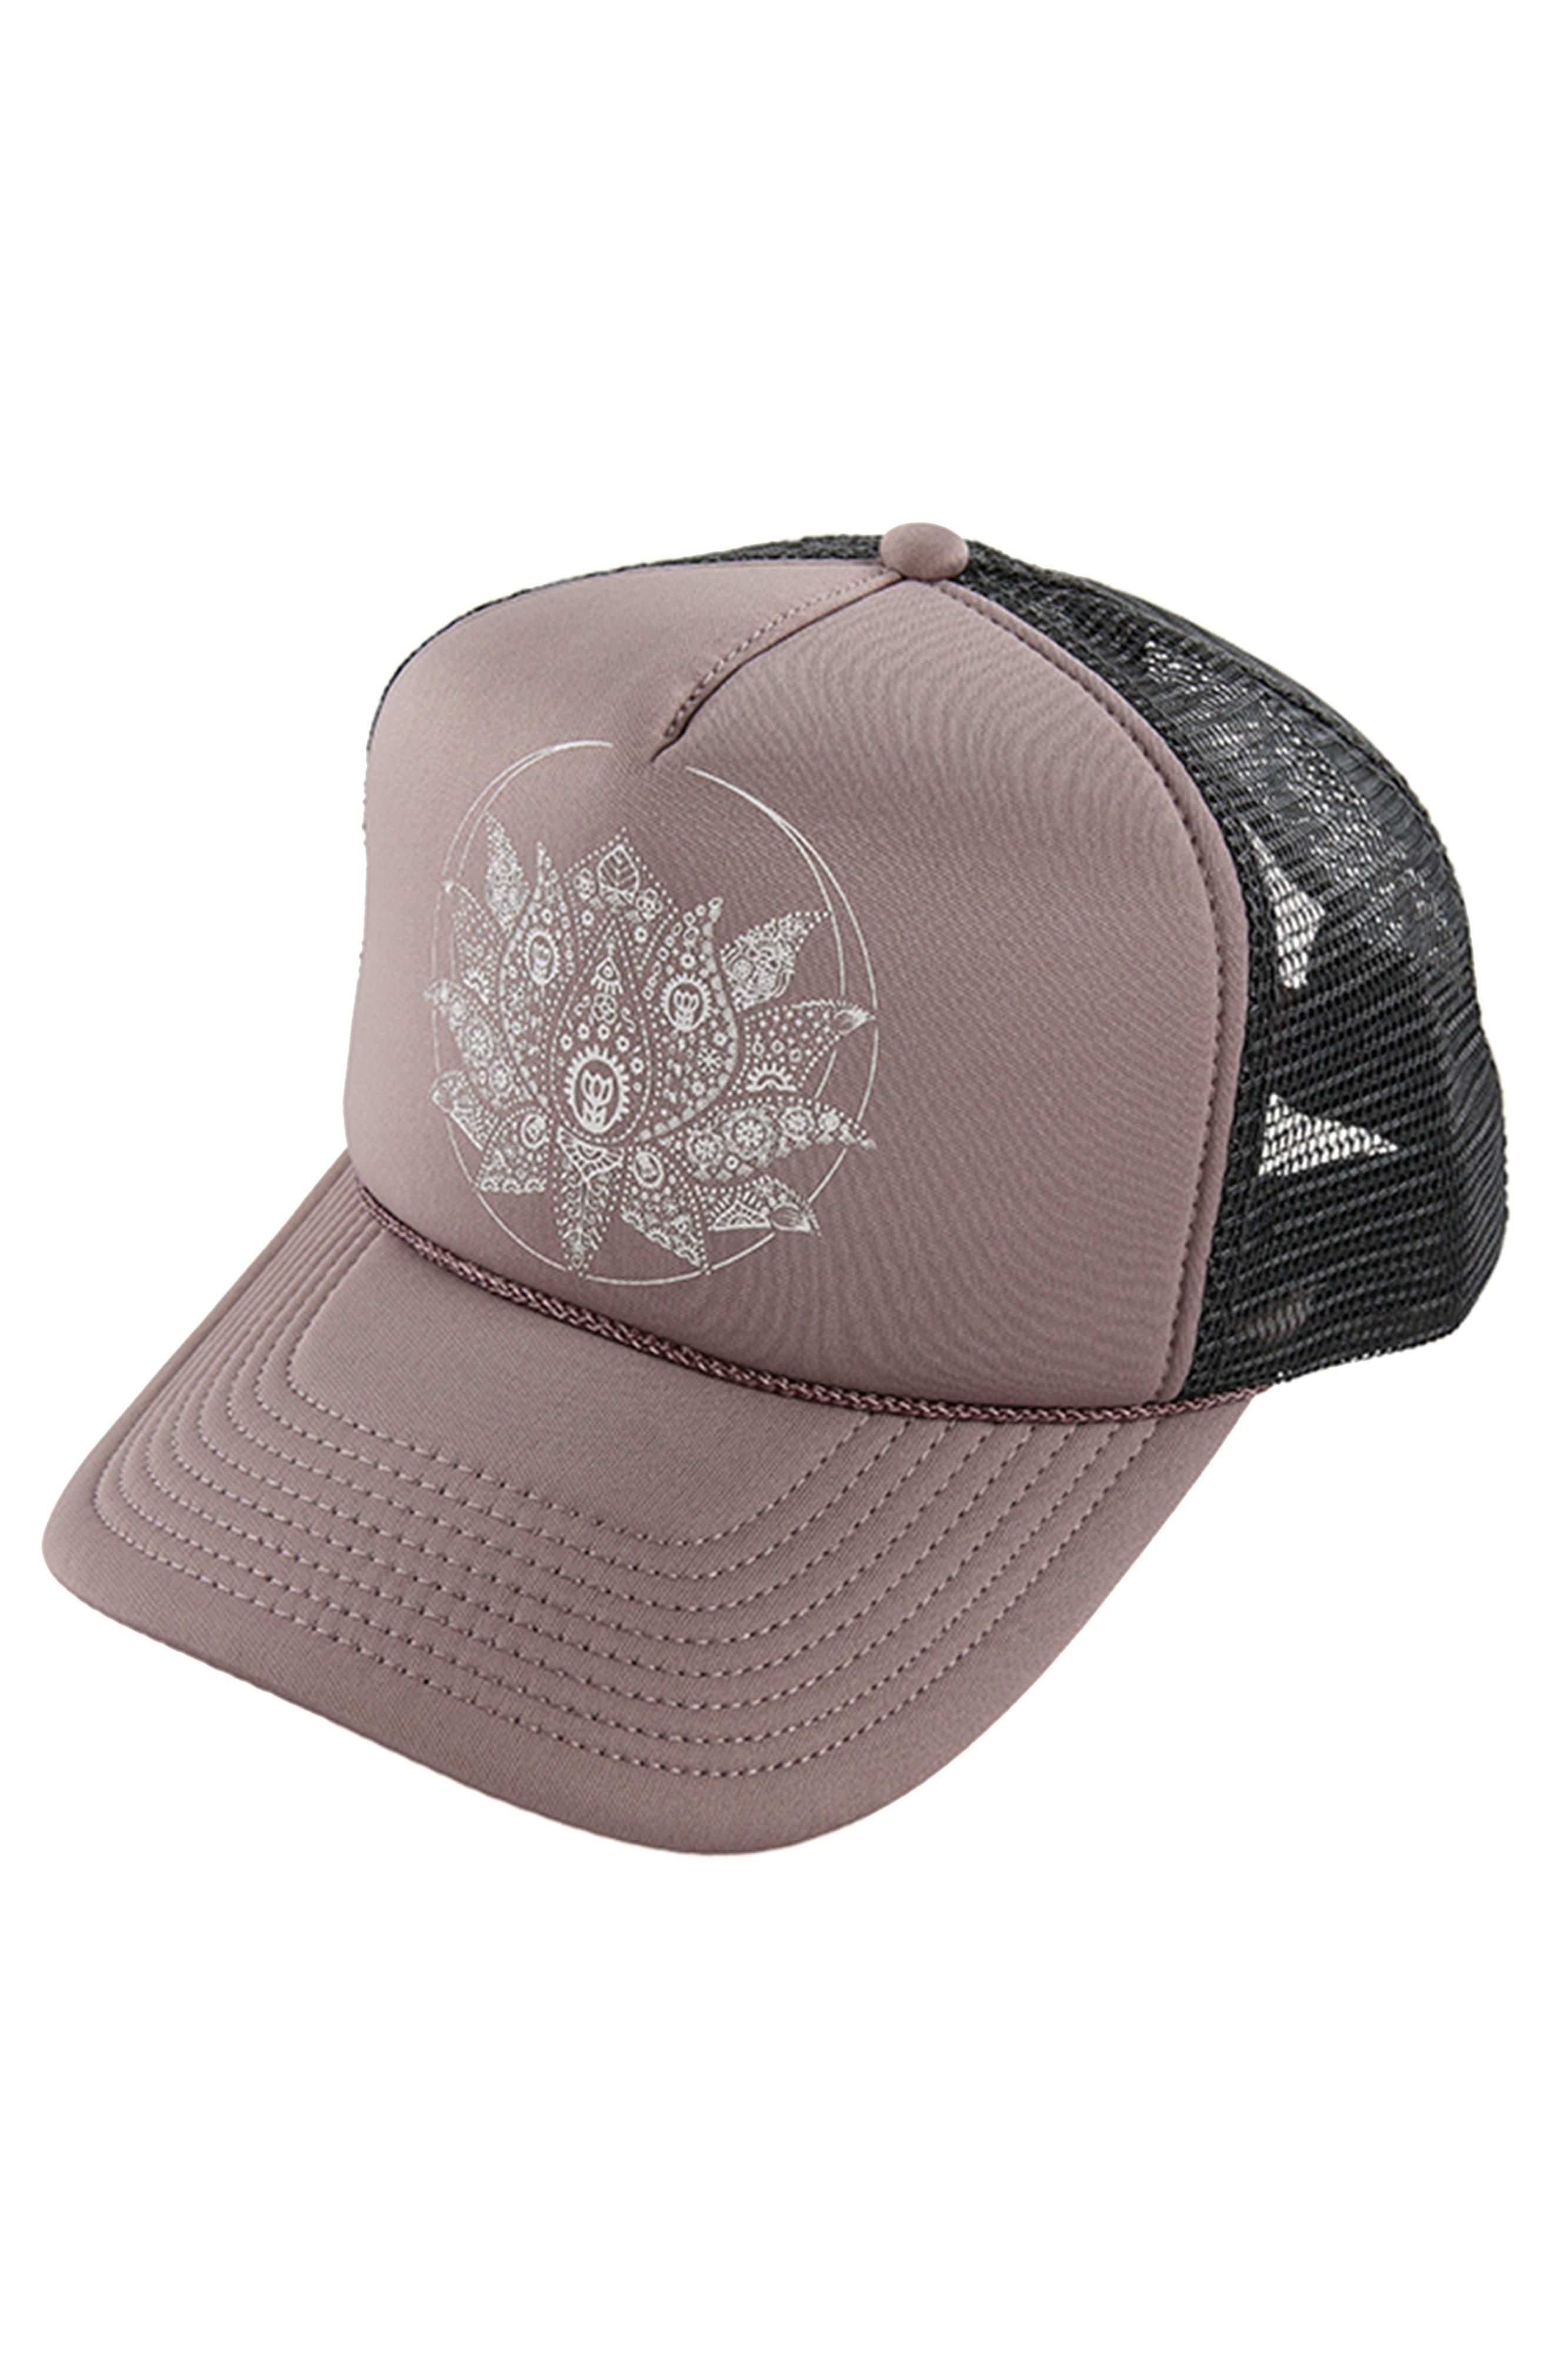 Zen Life Aloha Trucker Hat,                             Main thumbnail 1, color,